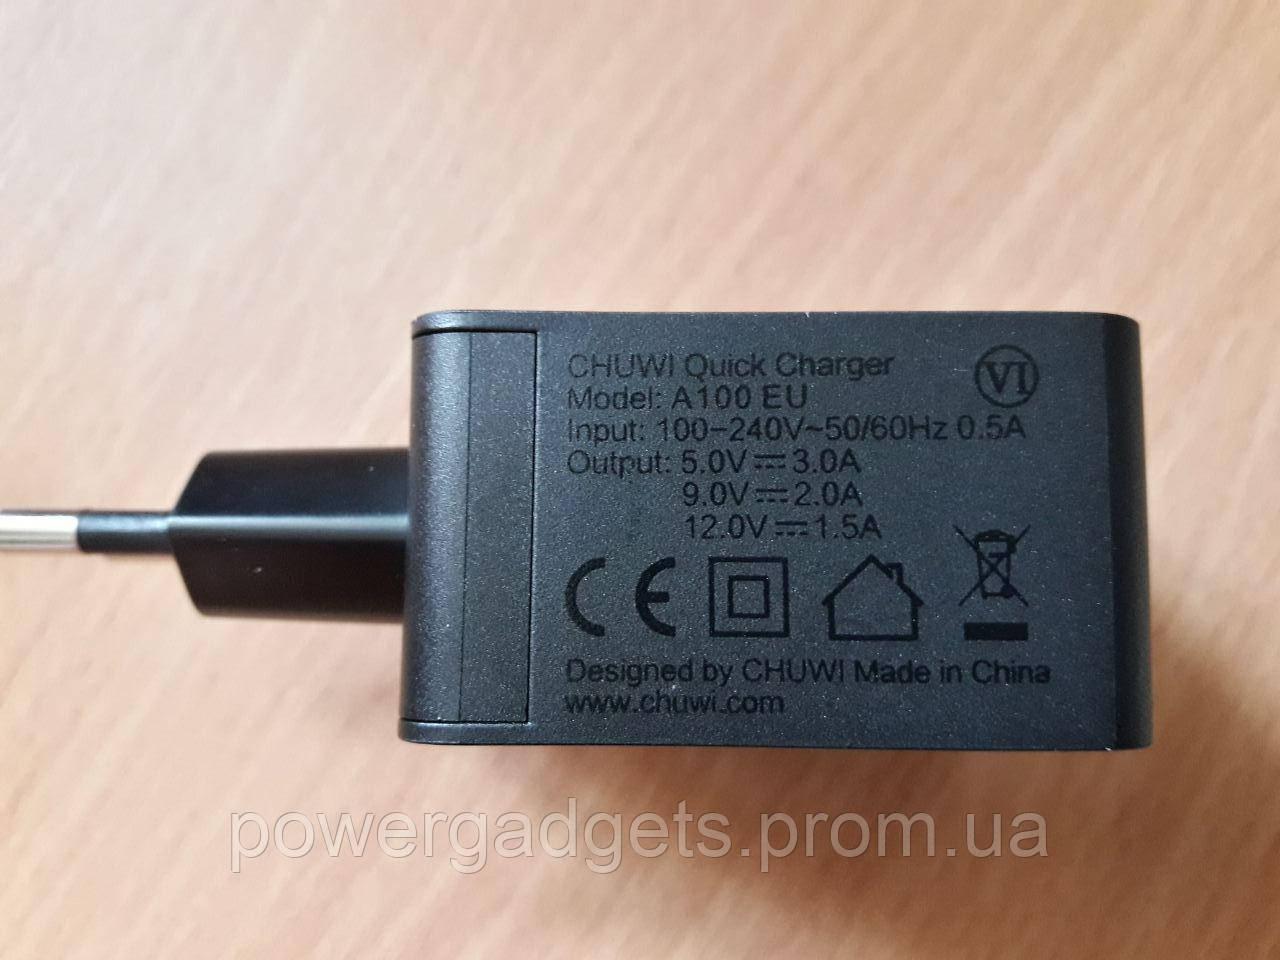 Быстрая зарядка CHUWI A 100 Qualcomm Quick Charge 3.0